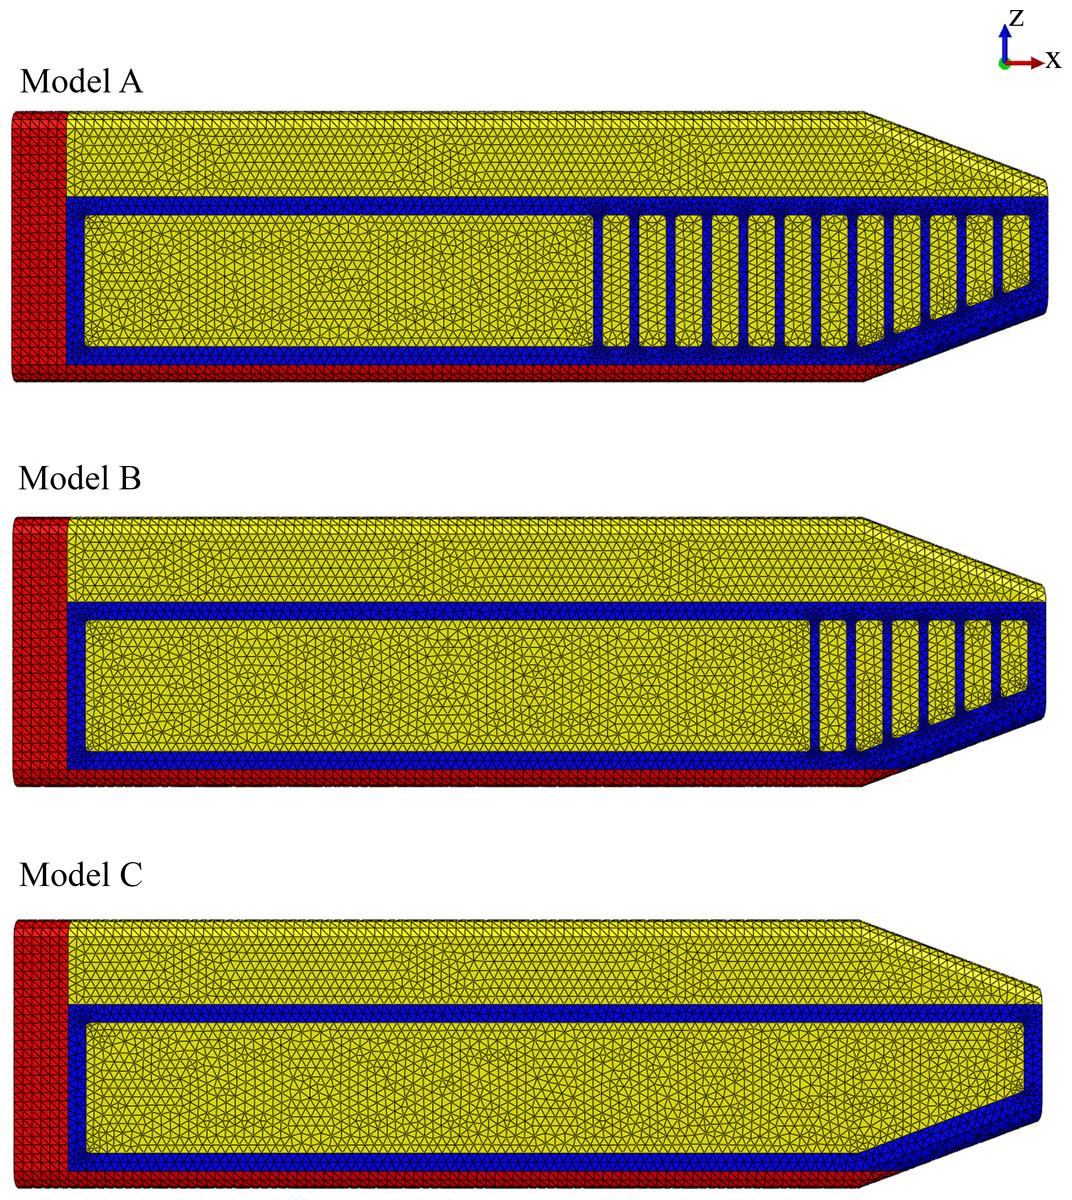 Architecture of the sperm whale forehead facilitates for Finite elemente modell